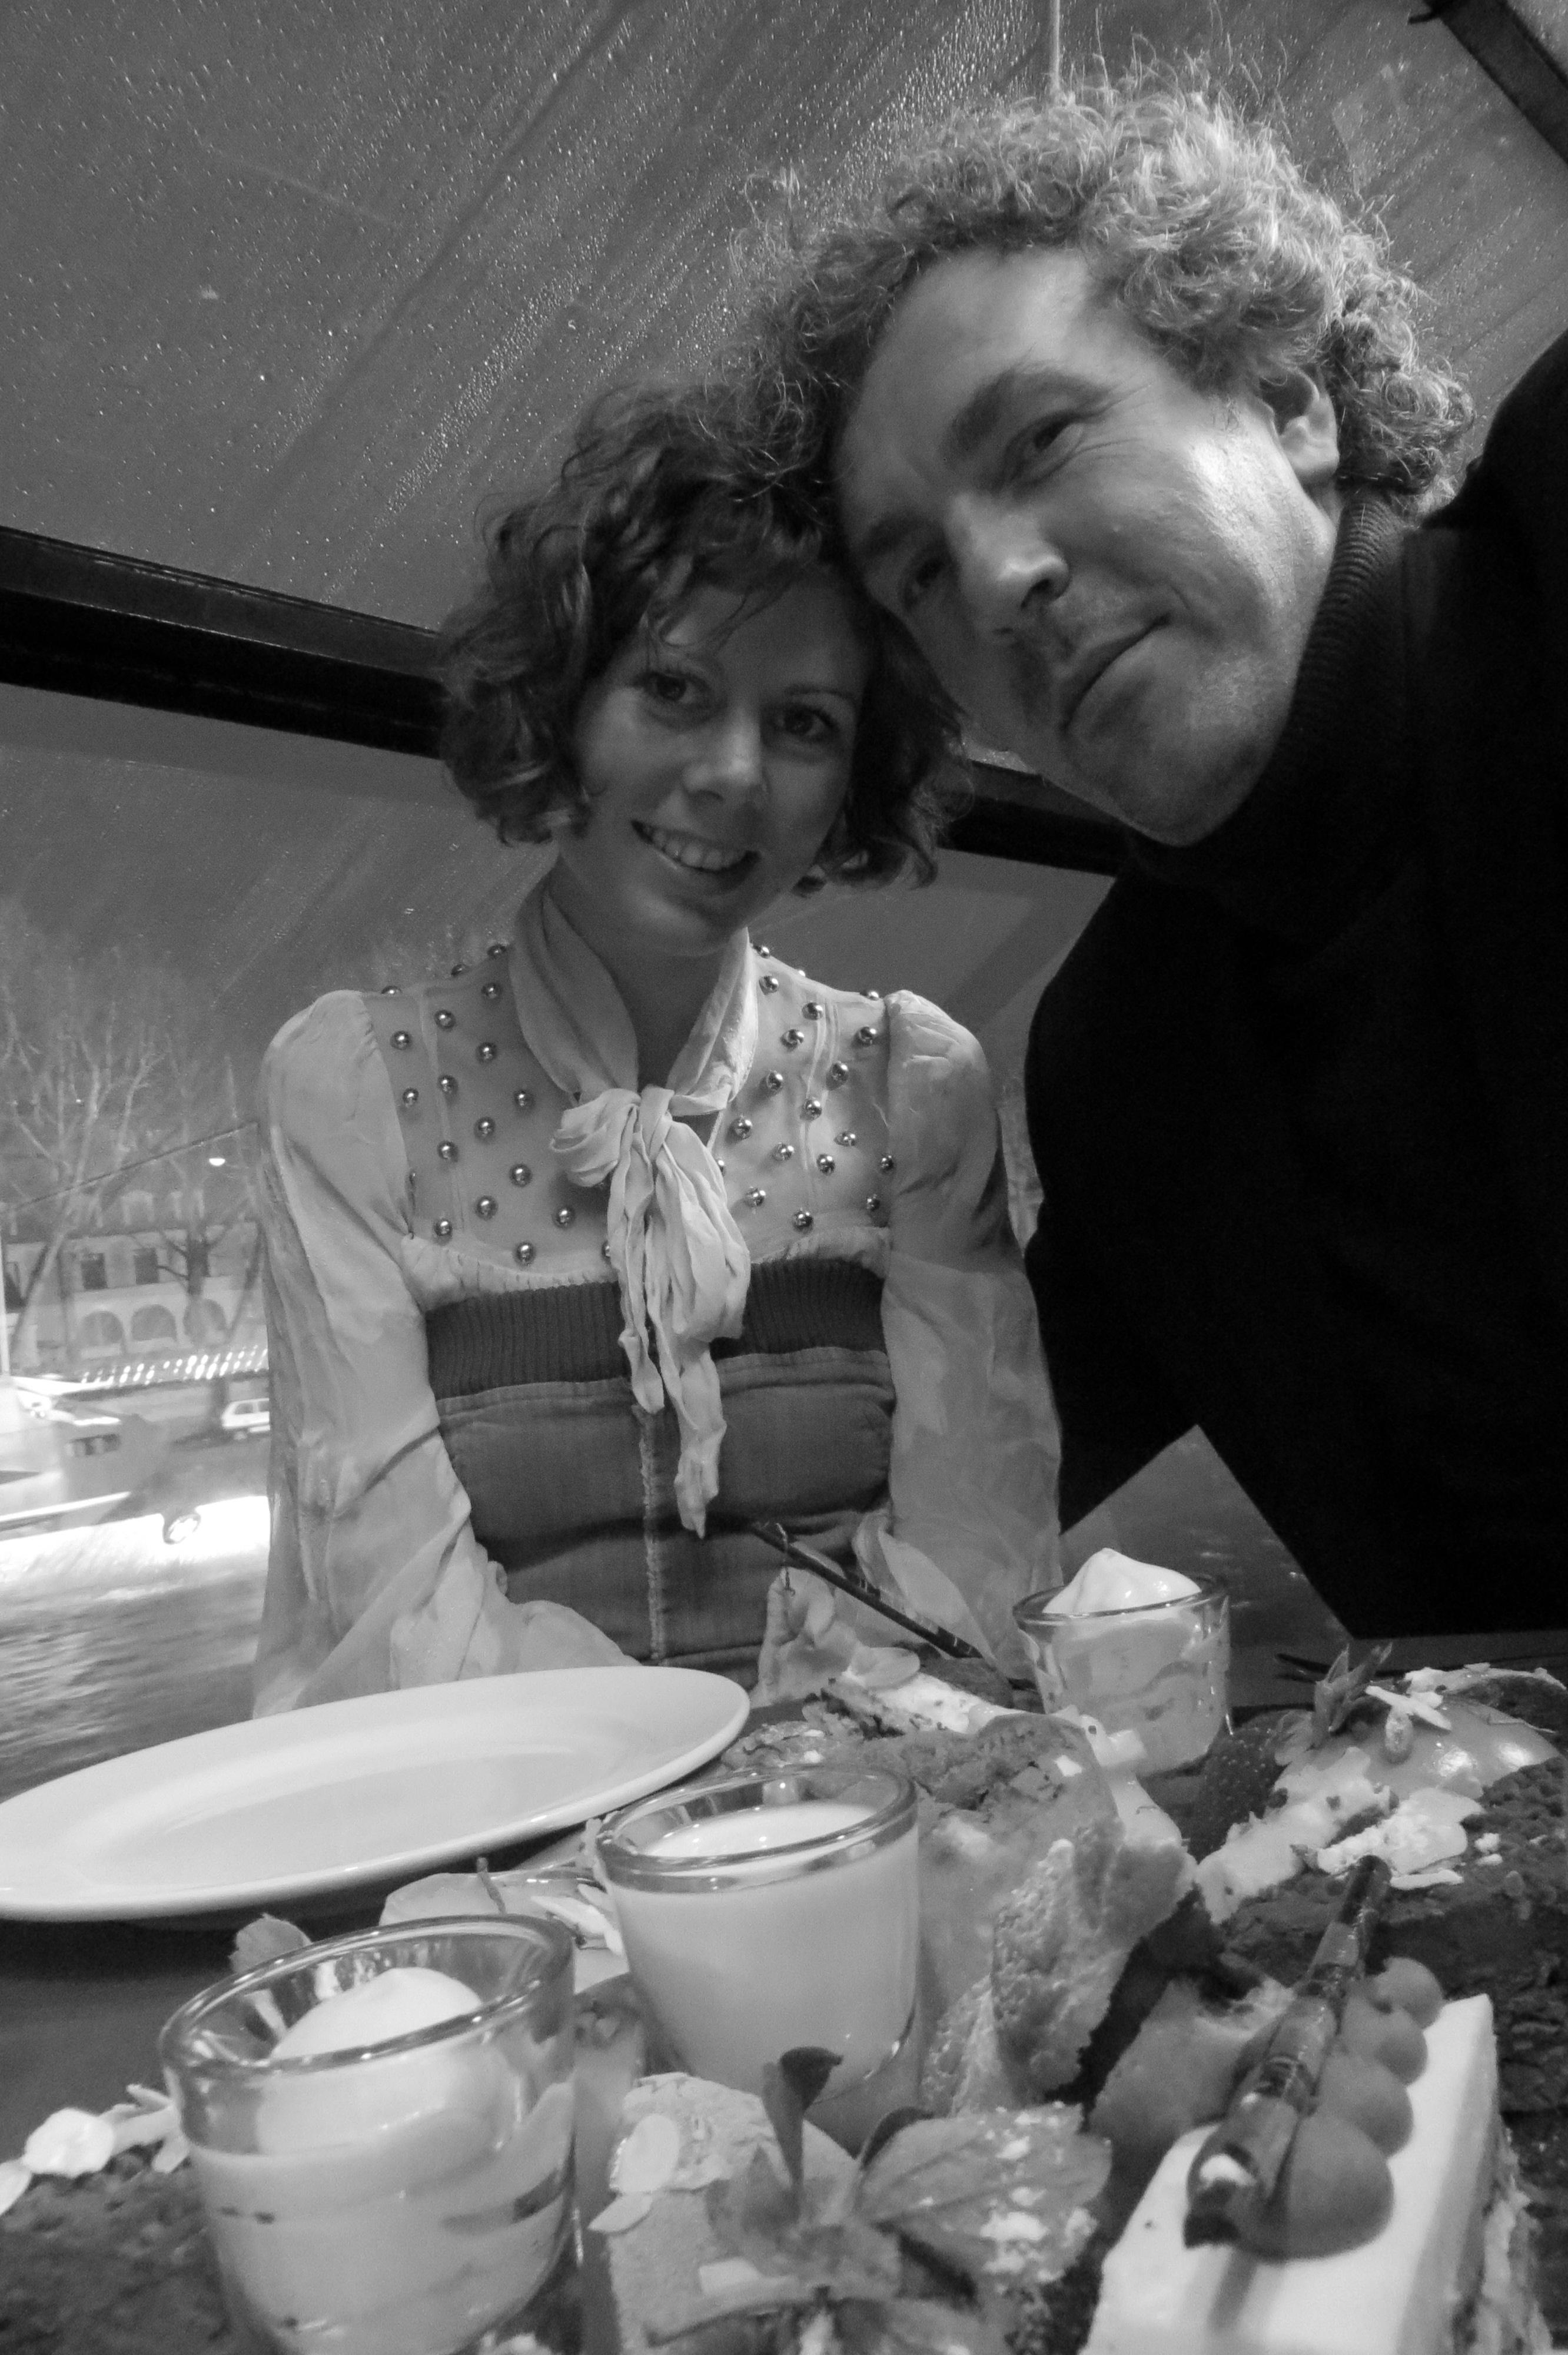 Bateaux mouches dinner cruise in Paris